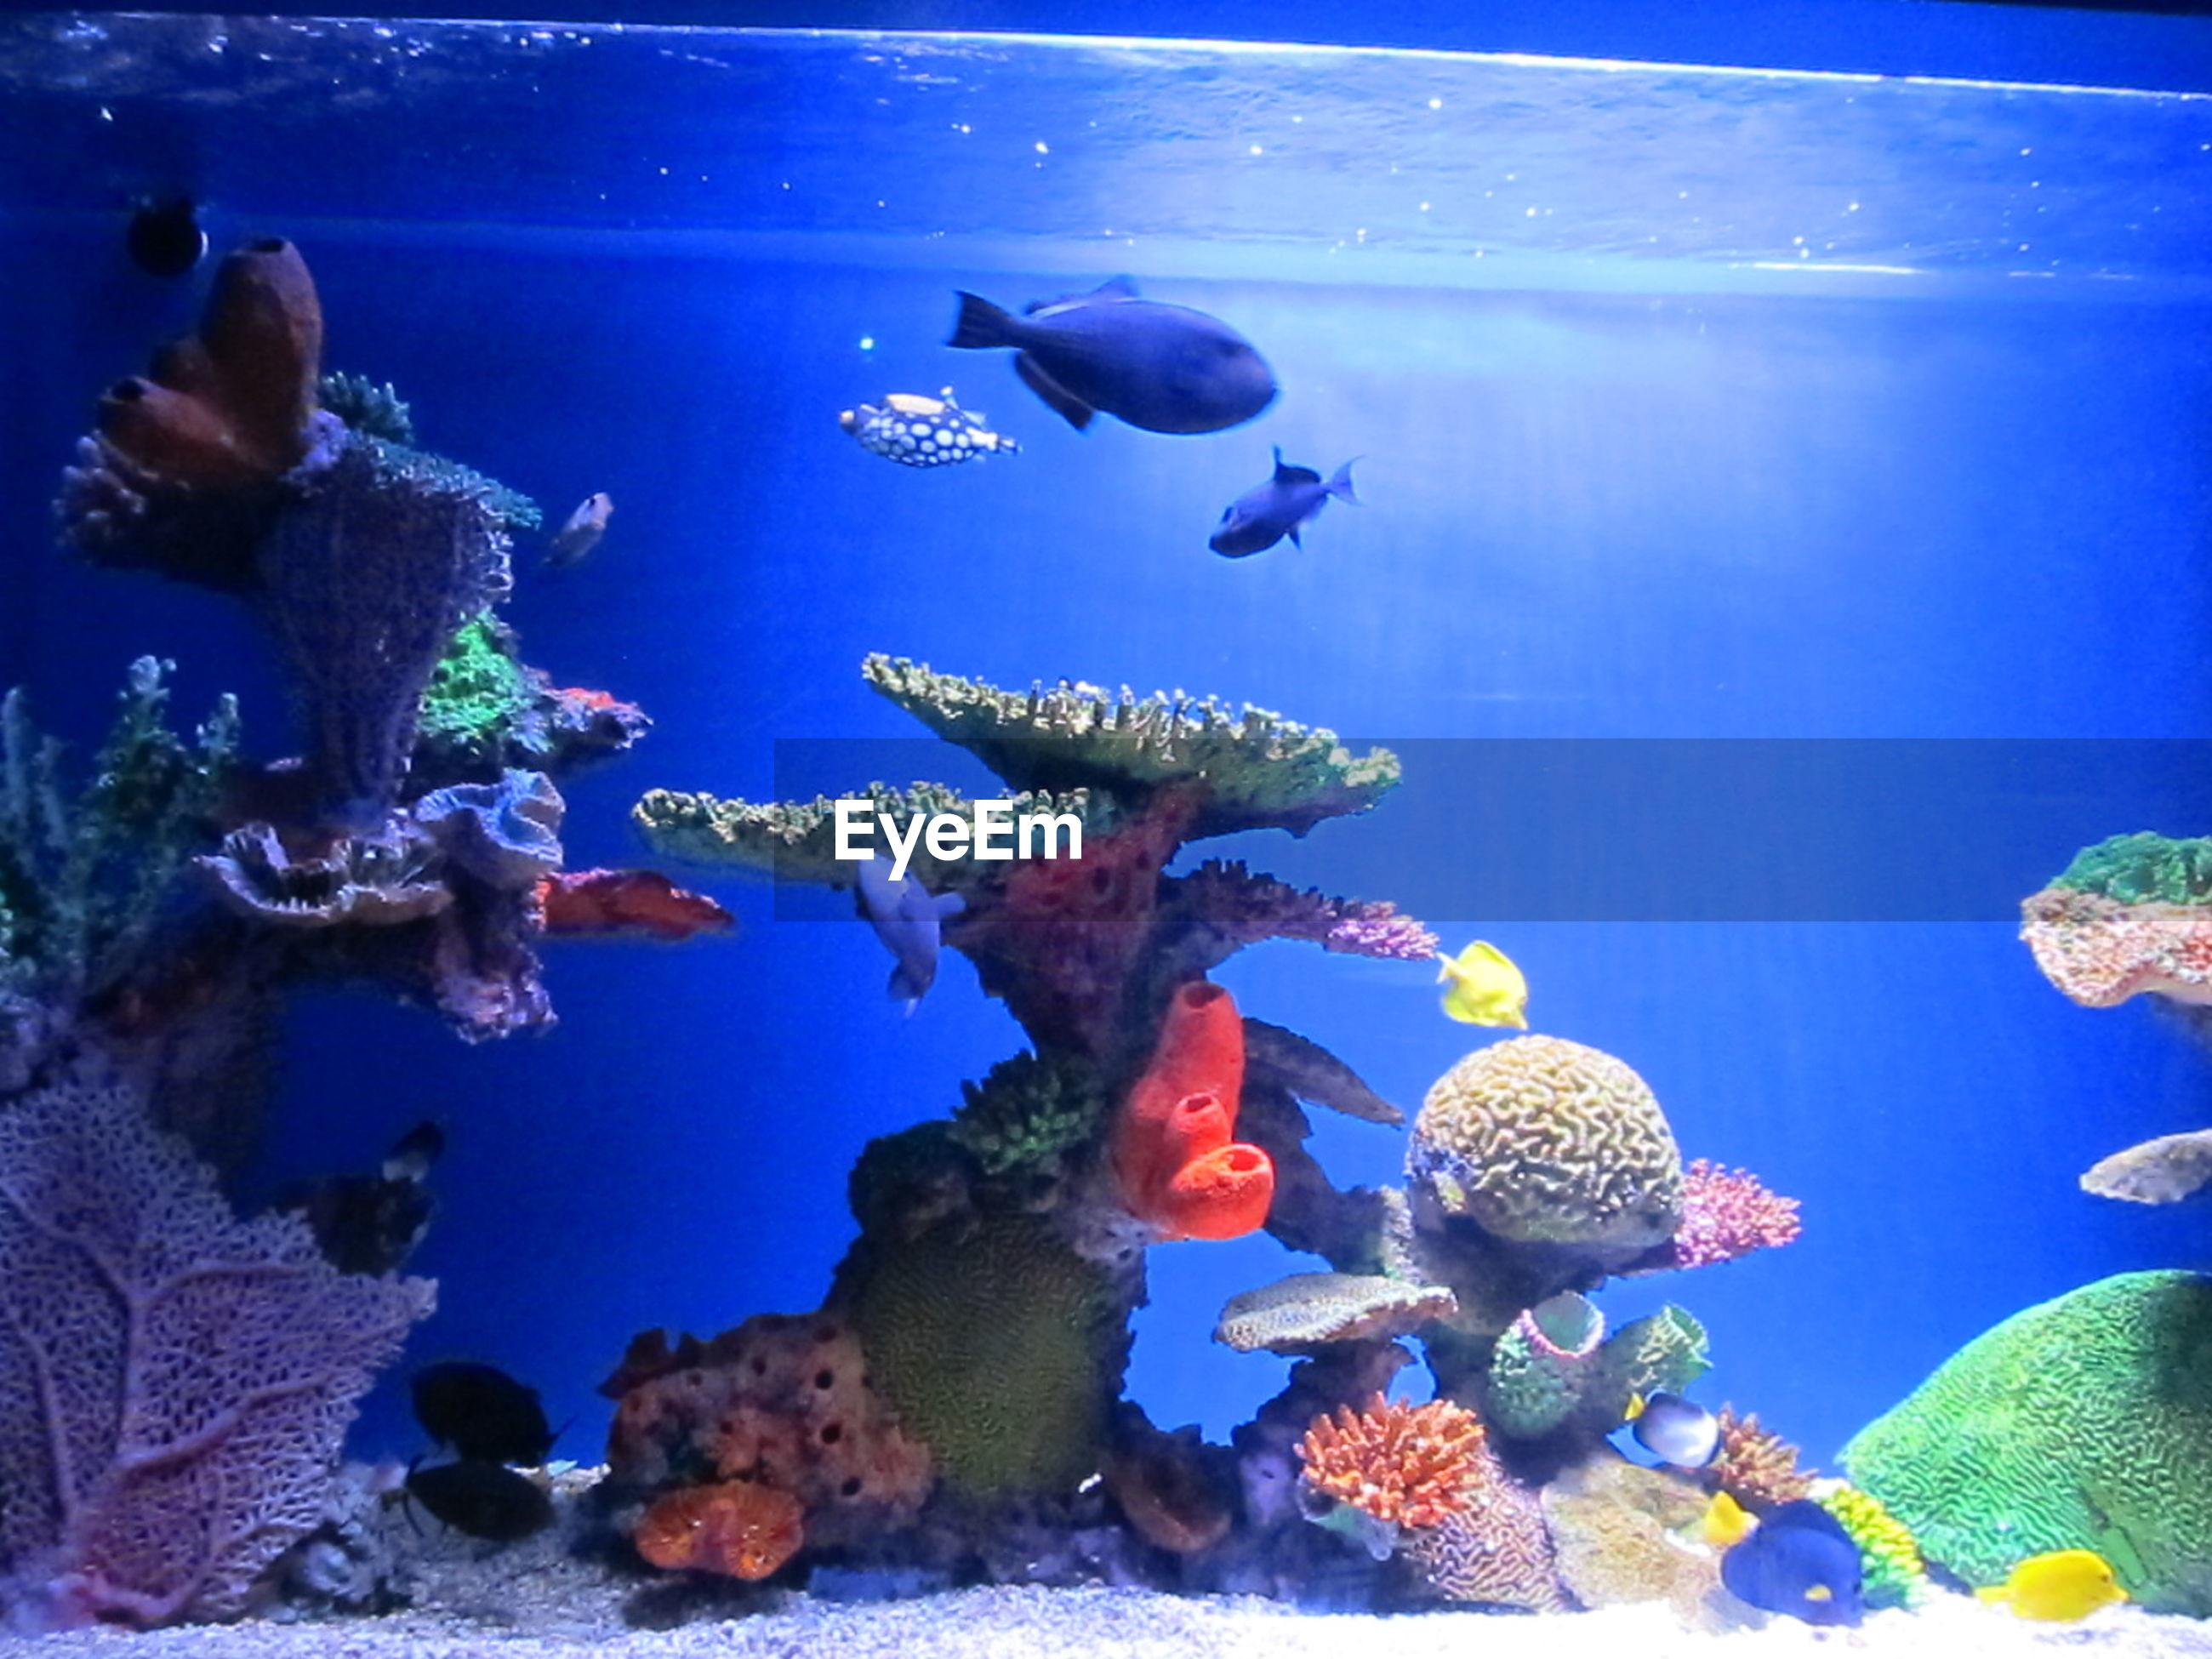 underwater, sea life, animal themes, fish, swimming, sea, blue, undersea, animals in the wild, wildlife, water, aquarium, indoors, coral, school of fish, togetherness, animals in captivity, nature, transparent